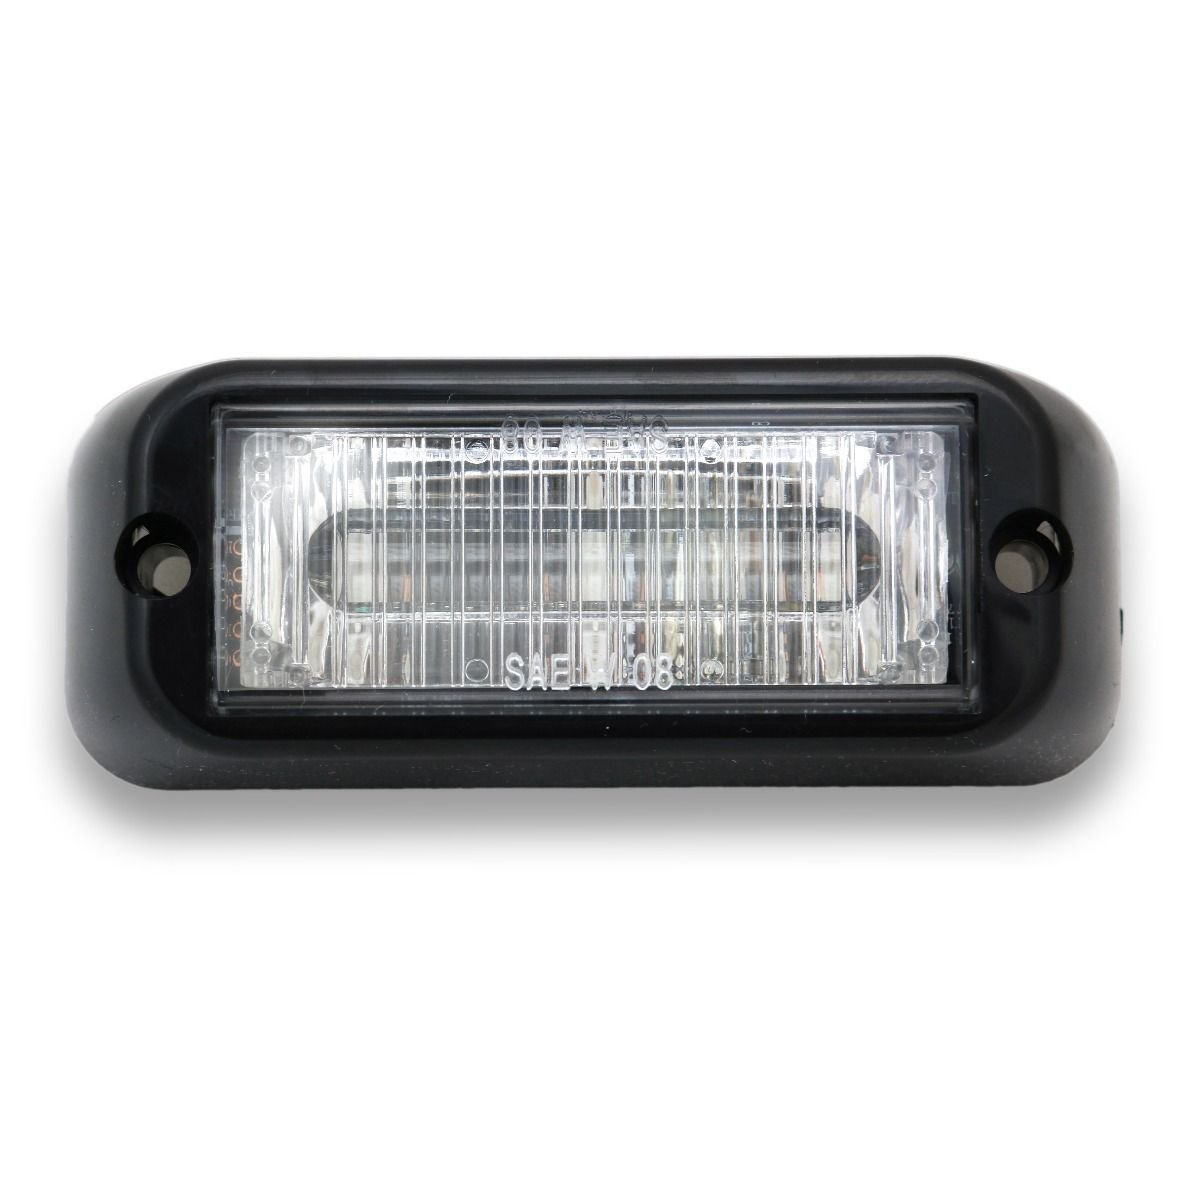 Abrams- EG-300-W Edge 3 LED Grill Light, White/White by Abrams